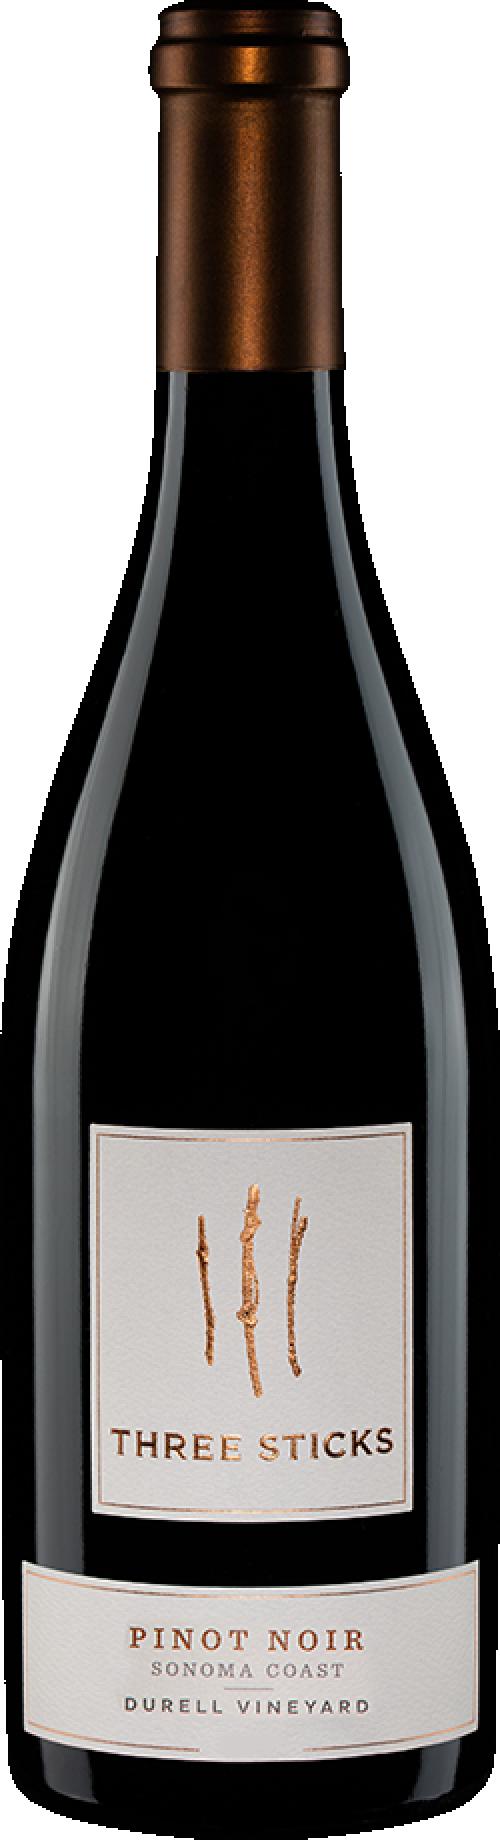 2014 Three Sticks Durell Vineyard Pinot Noir 750ml